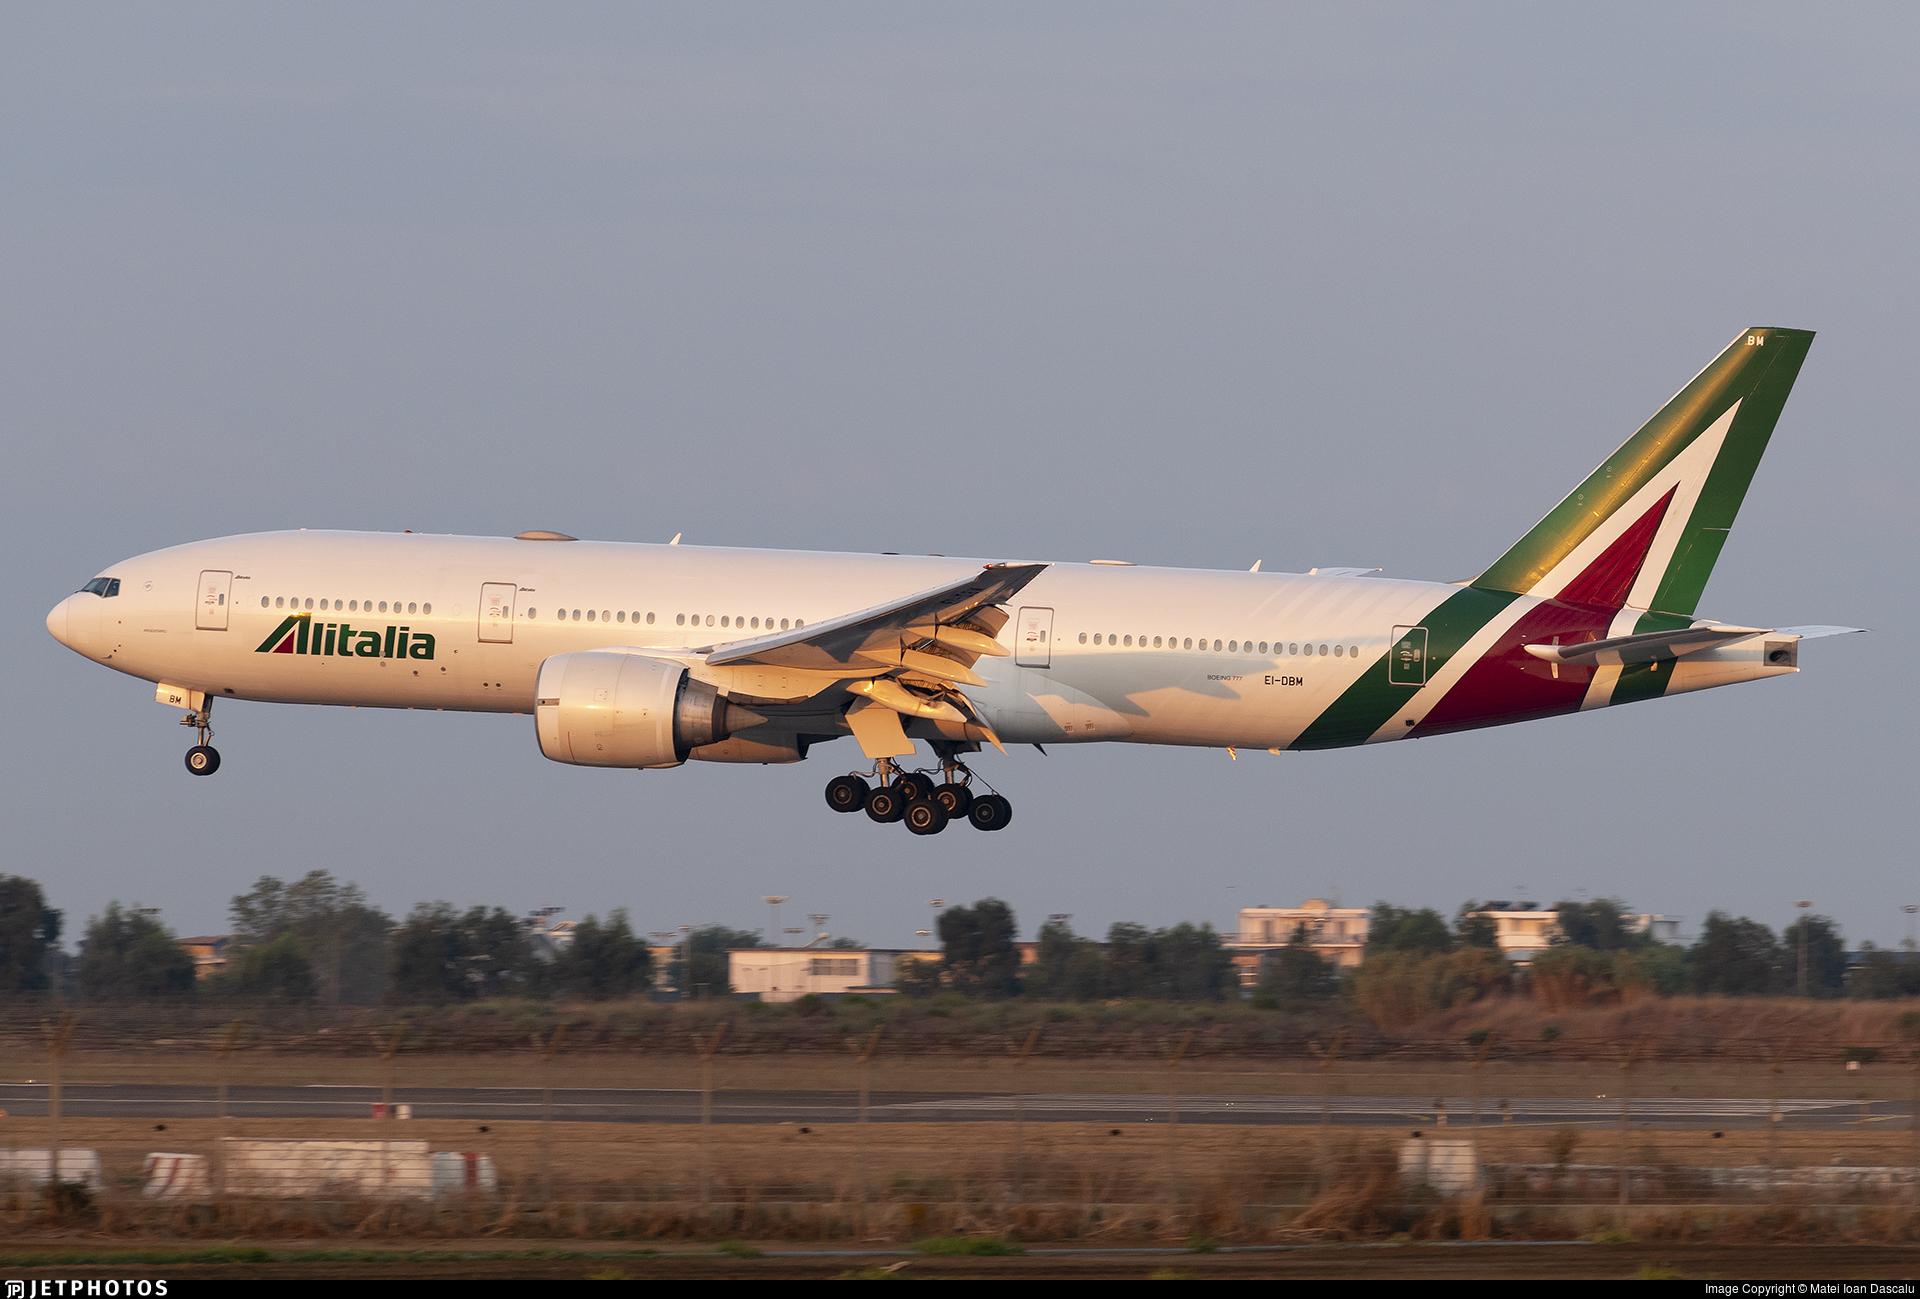 EI-DBM - Boeing 777-243(ER) - Alitalia